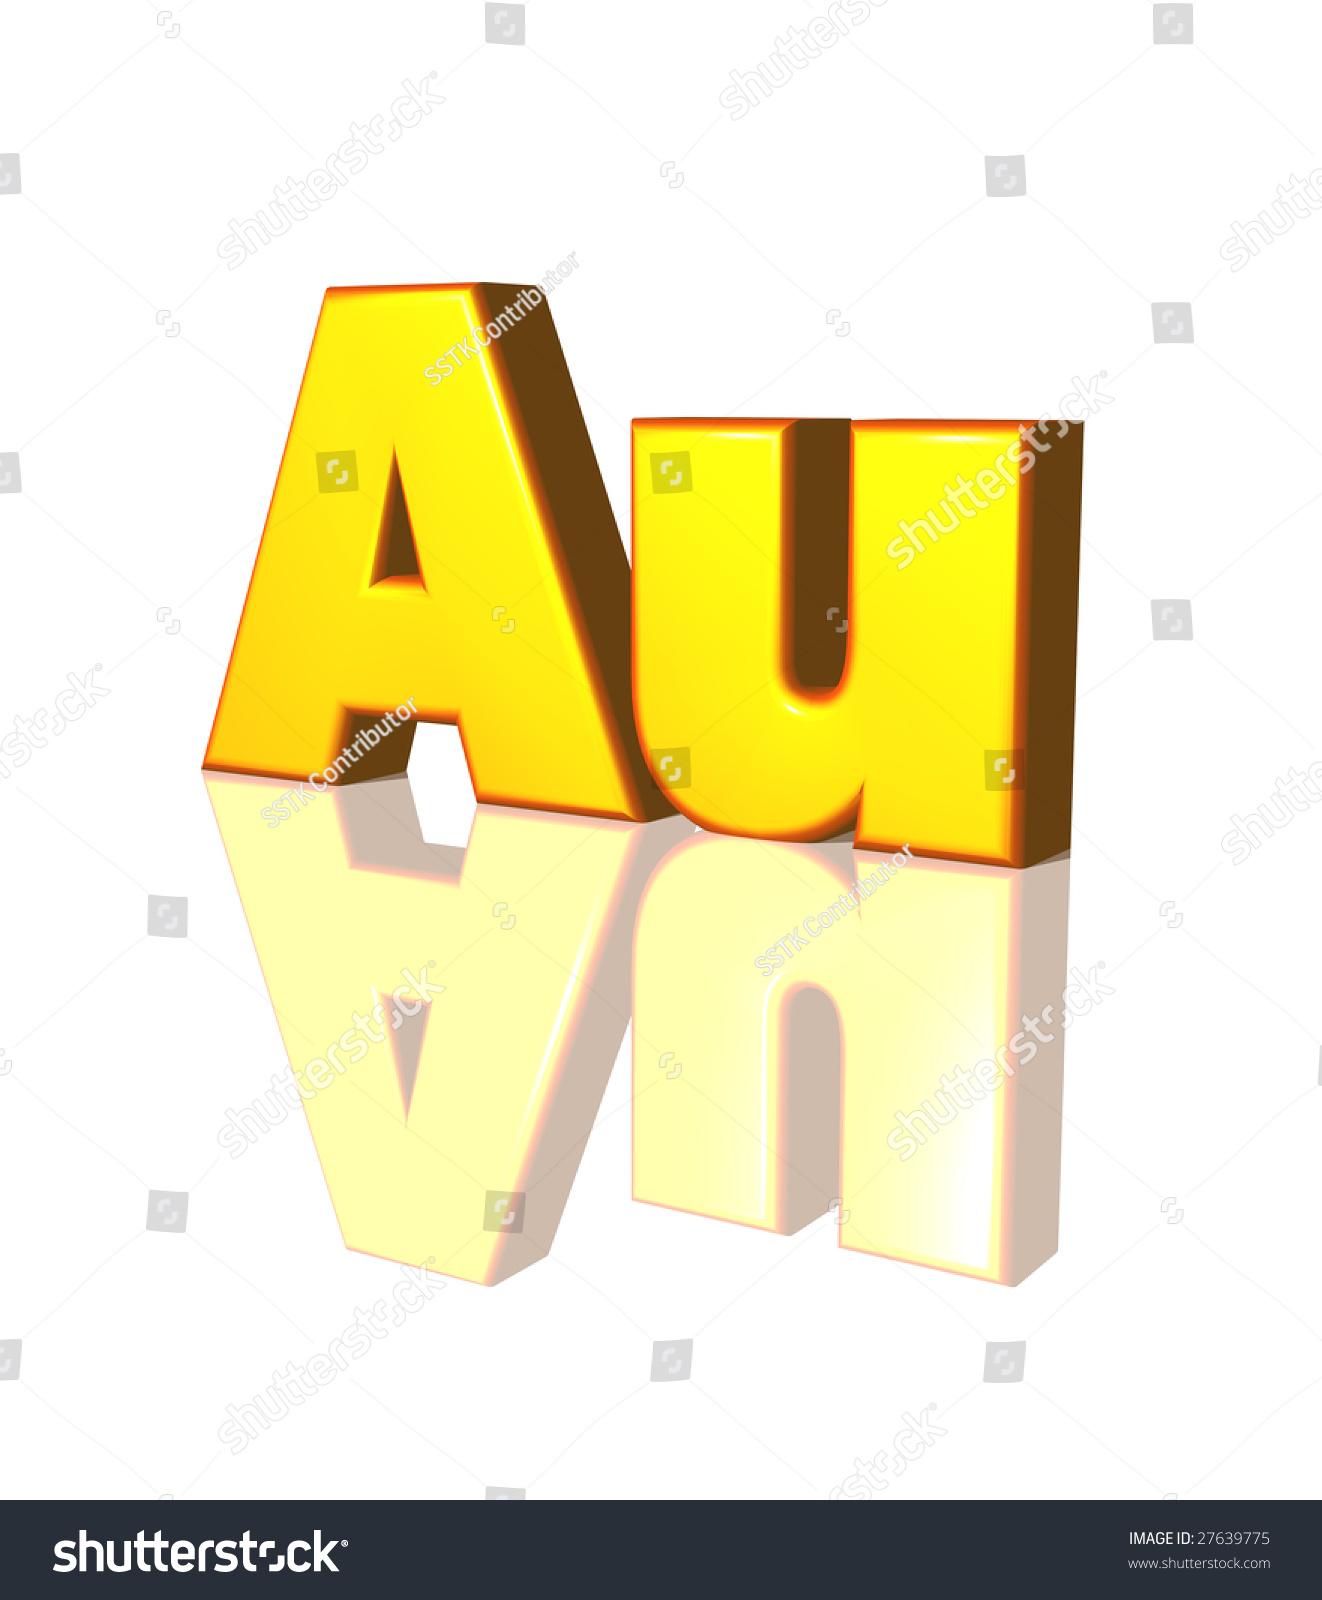 Chemical Symbol Gold Au 3 D Illustration Stock Illustration 27639775